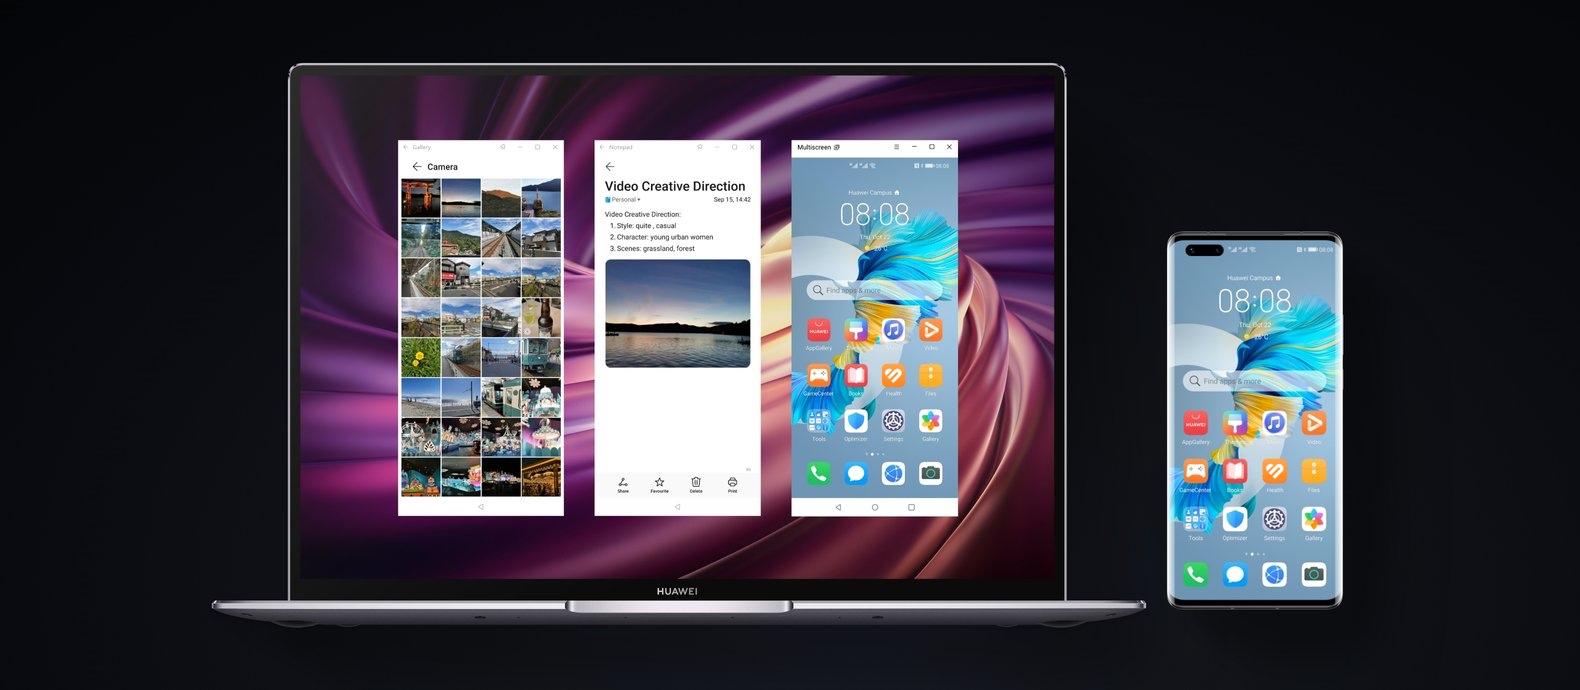 huawei mate 40 pro multi-screen collaboration